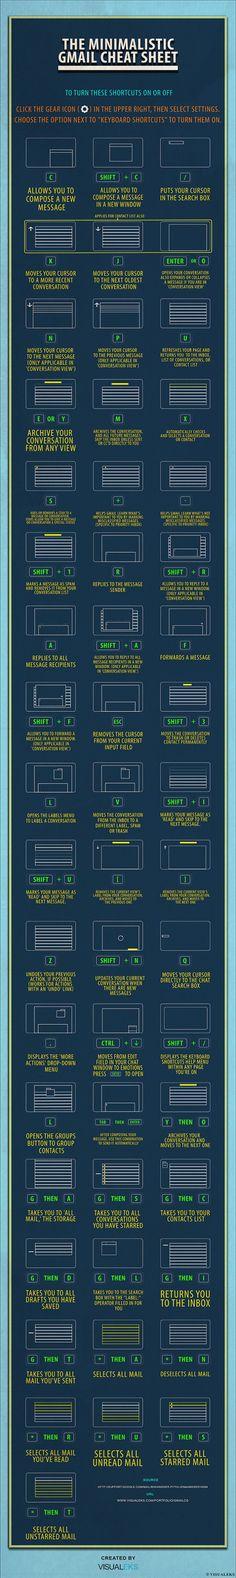 The Minimalistic Gmail Cheat Sheet Infographic